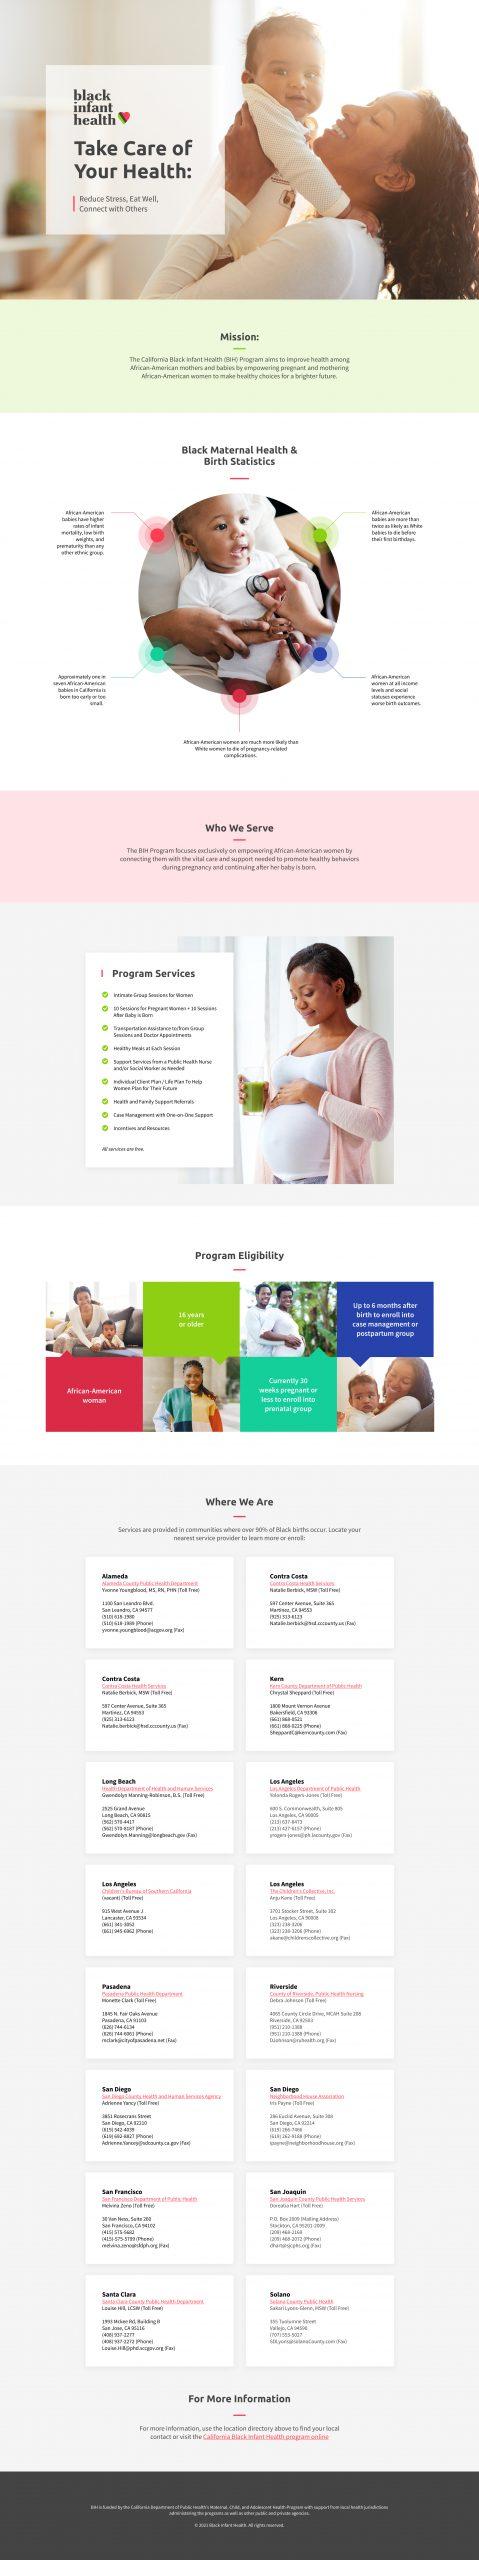 City of Long Beach Black Infant Health Website